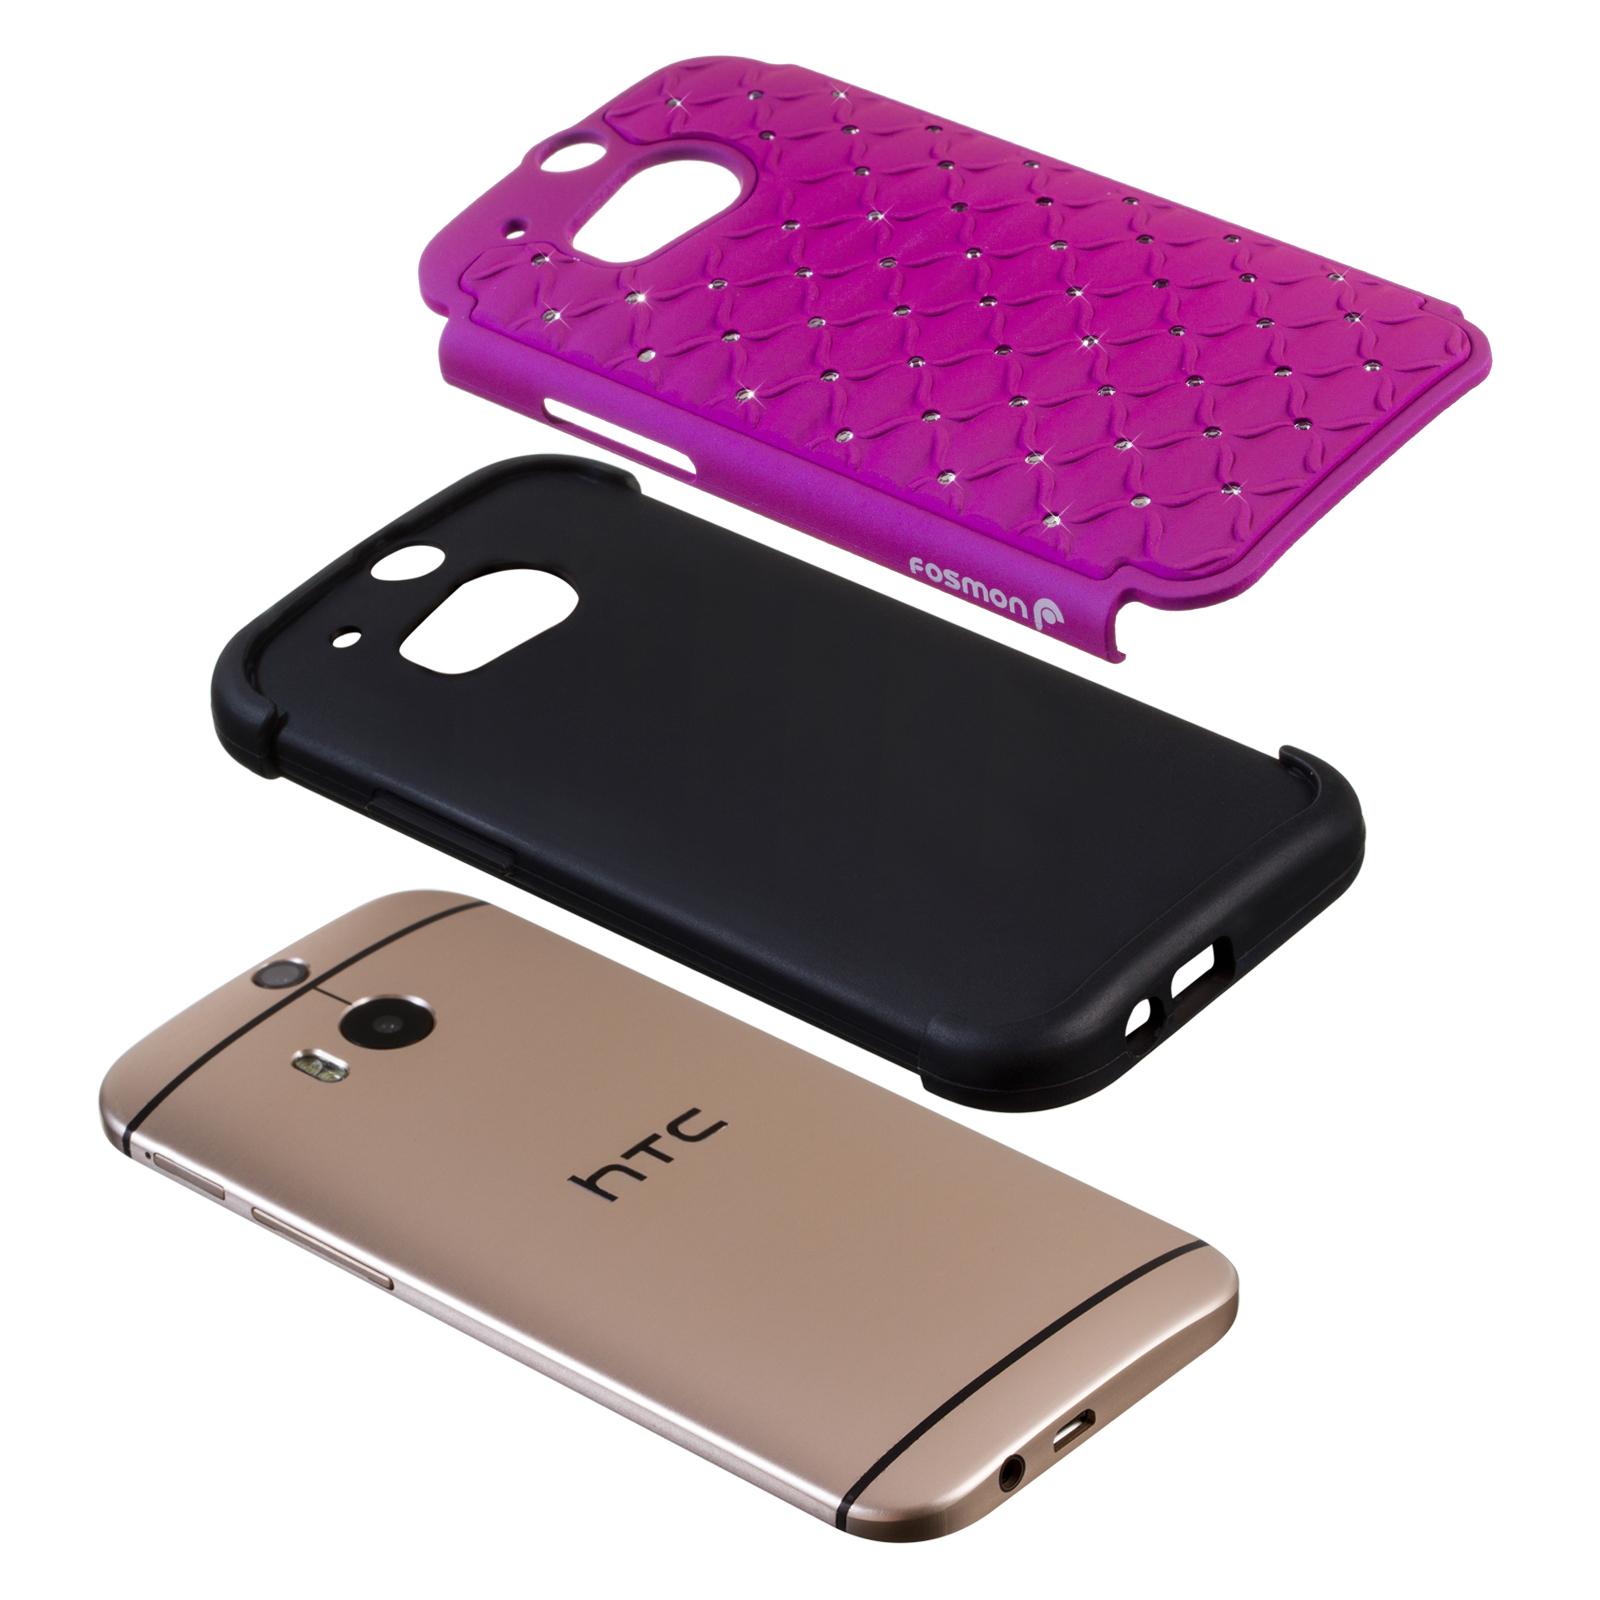 New Heavy Duty Hard Soft Hybrid Bling Diamond Case Cover for HTC One M8 2014